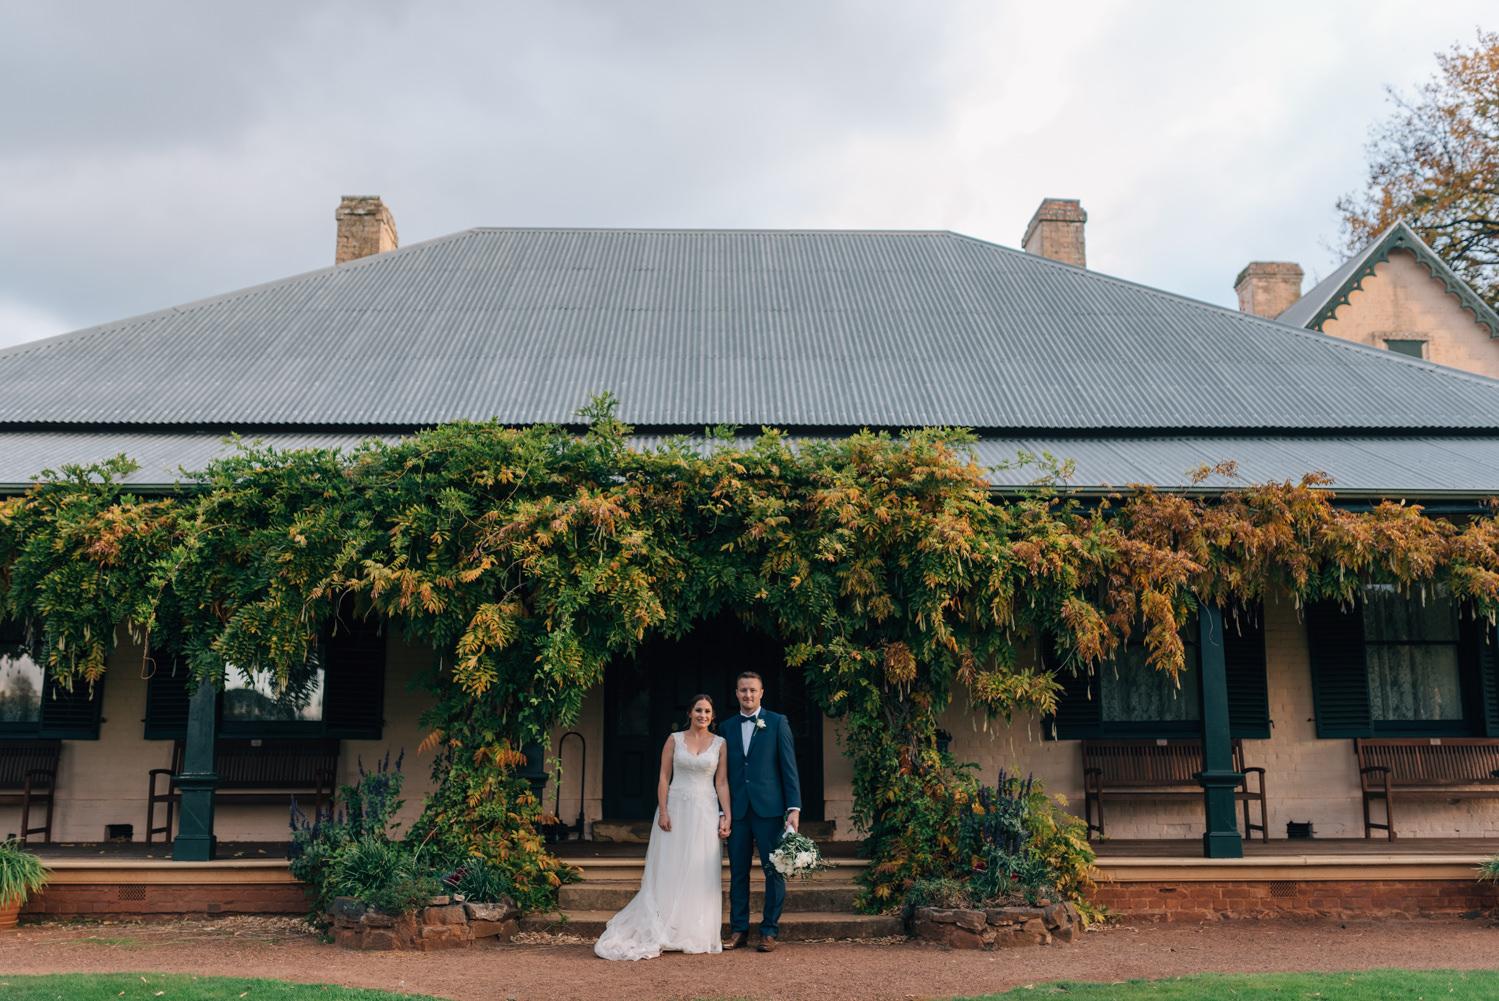 Entally-Wedding-Photography-61.jpg